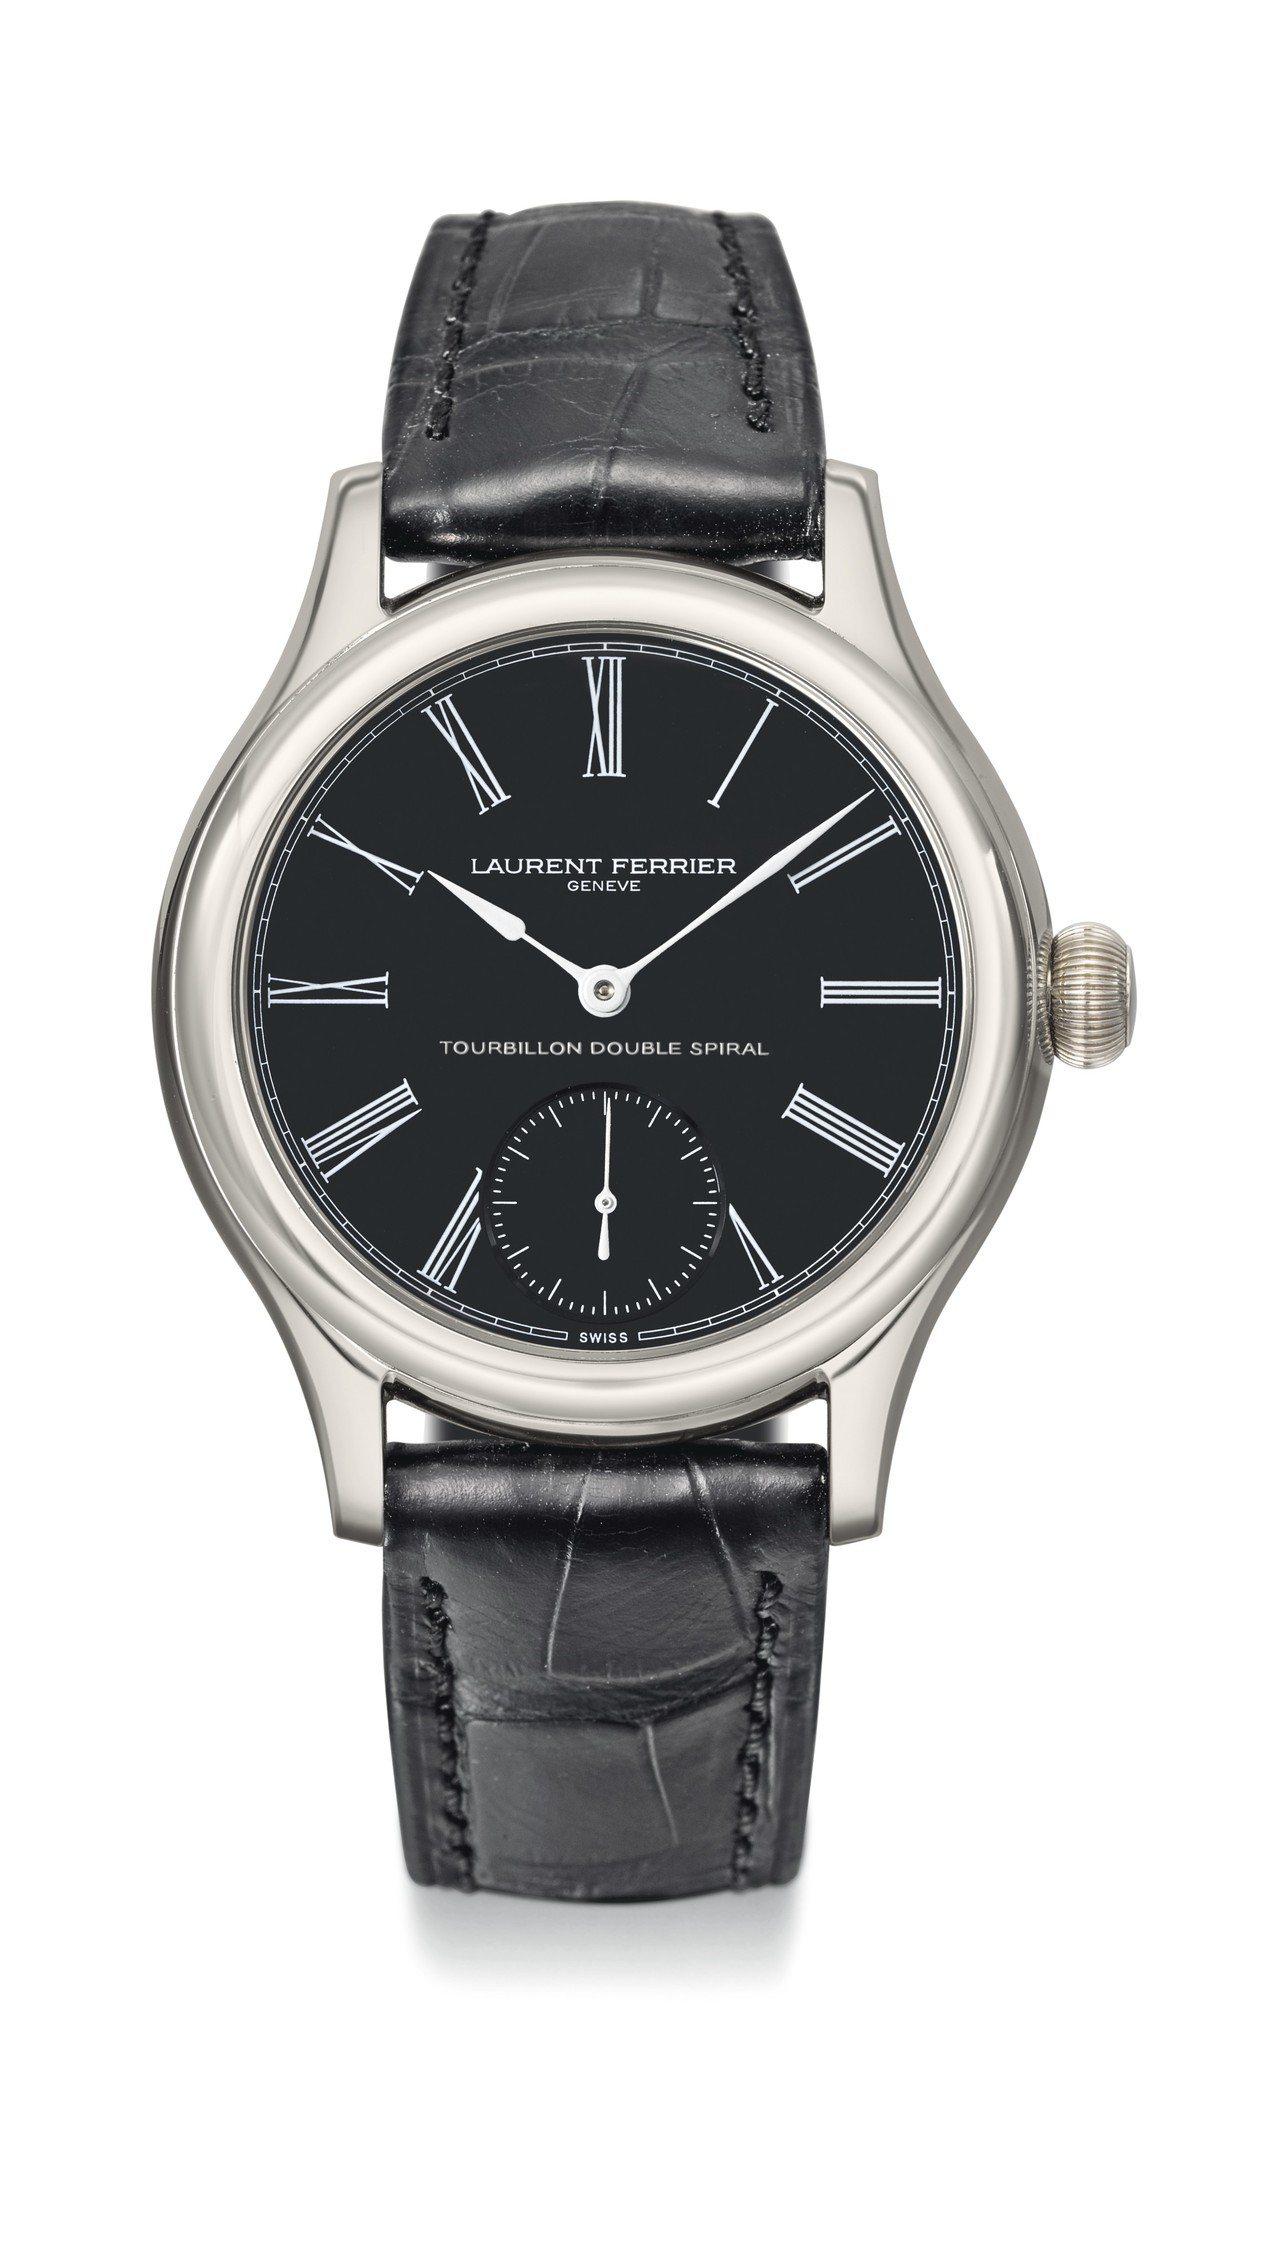 獨立製表師同名品牌Laurent Ferrier,黑瑪瑙表盤雙游絲陀飛輪腕表,約...